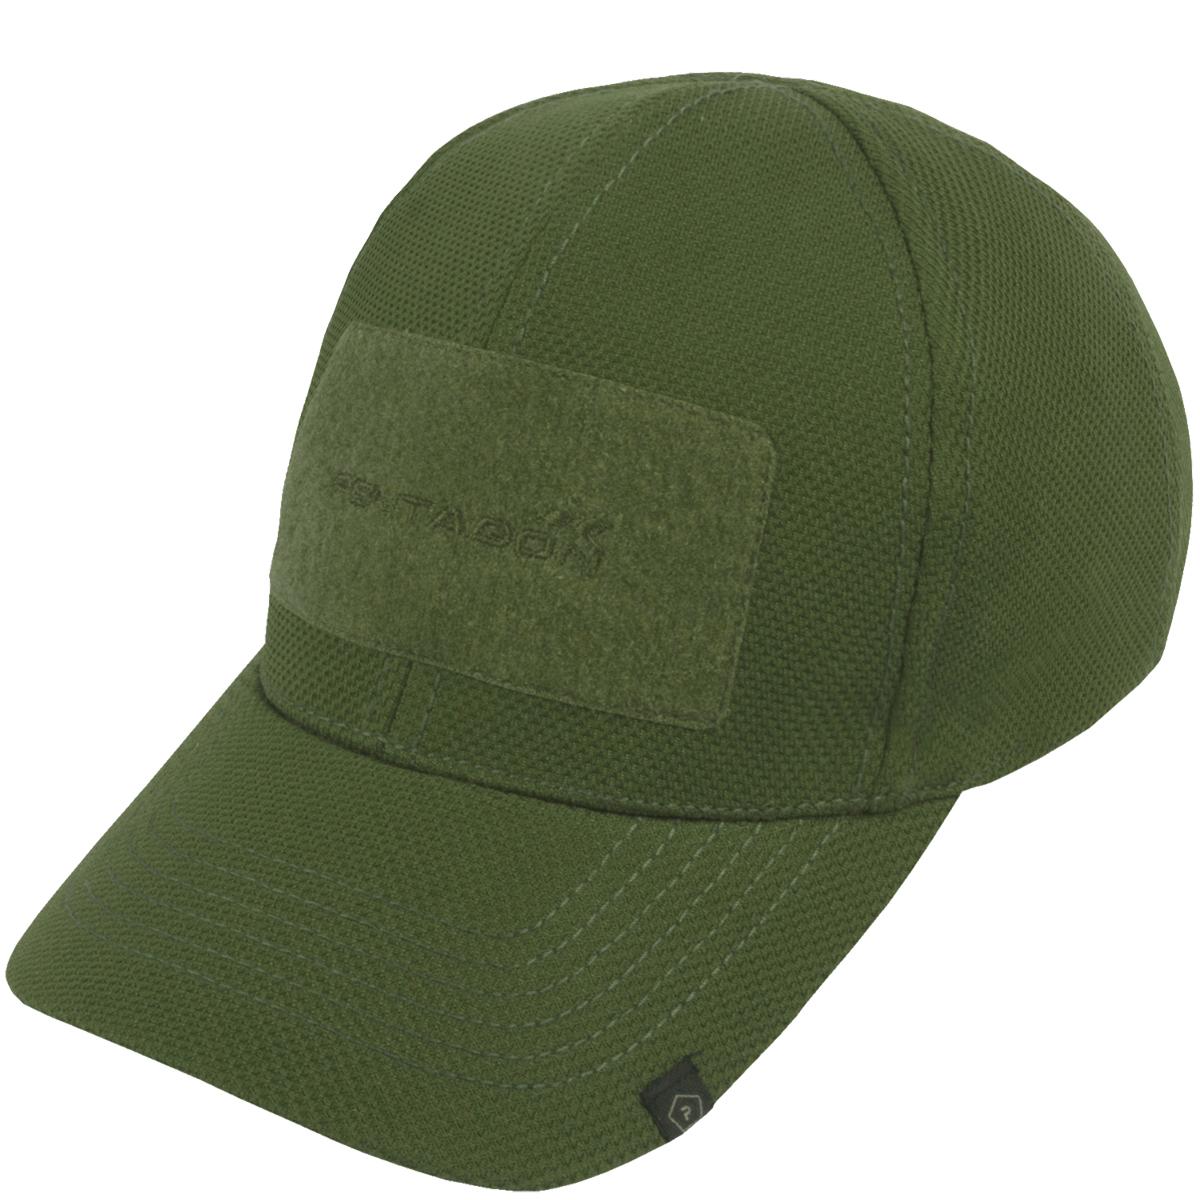 1b3cab62 Details about Pentagon Nest BB Cap Combat Tactical Patrol Head Cover  Baseball Hat Olive Green